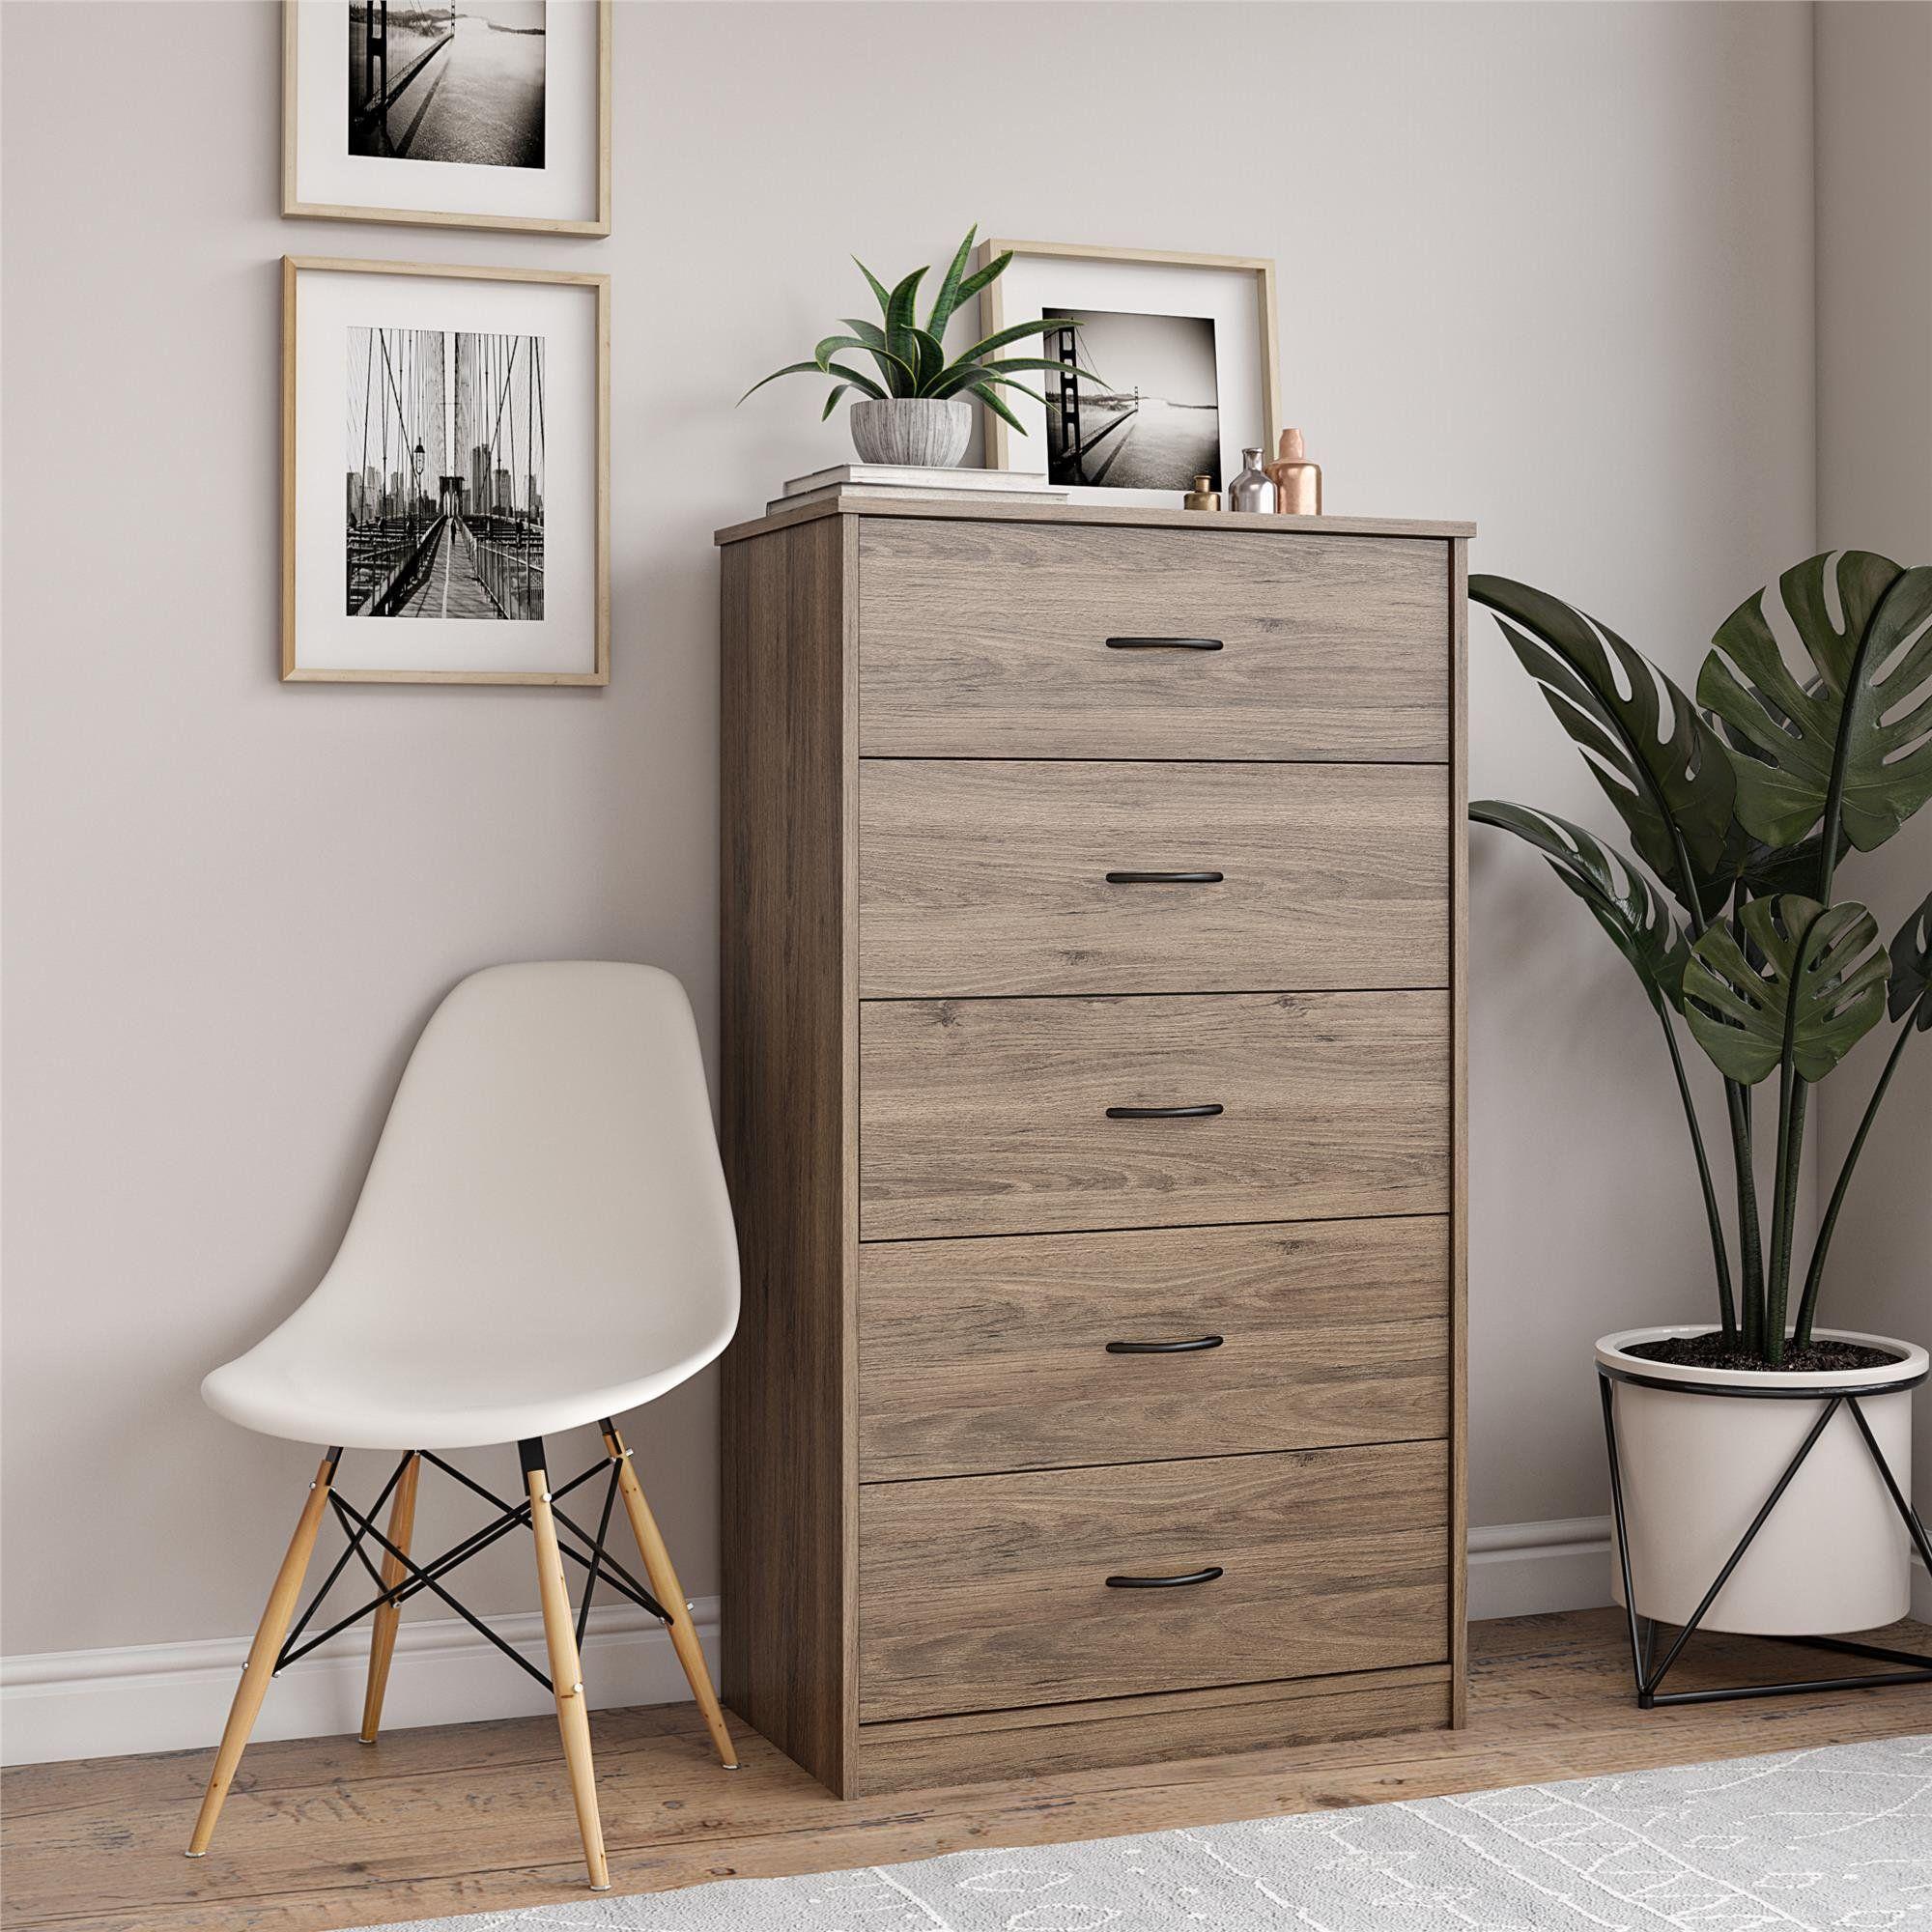 Mainstays Classic 5 Drawer Dresser Rustic Oak Finish Walmart Com In 2021 5 Drawer Dresser Dresser Drawers Wood Dresser [ 2000 x 2000 Pixel ]